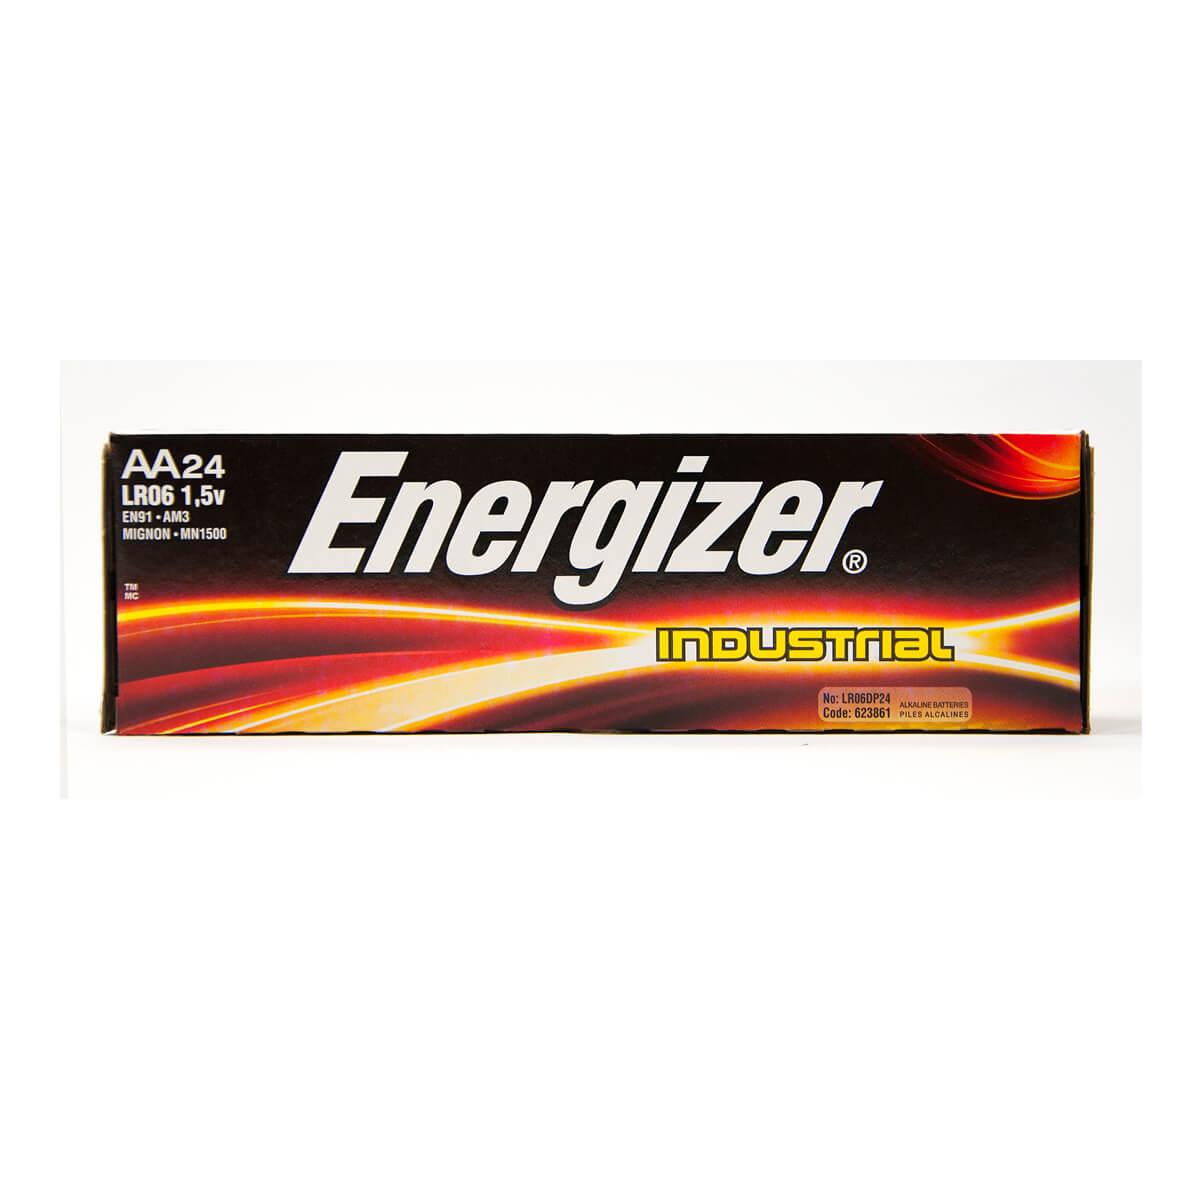 Energizer Industrial AA Batteries - 24-Pack